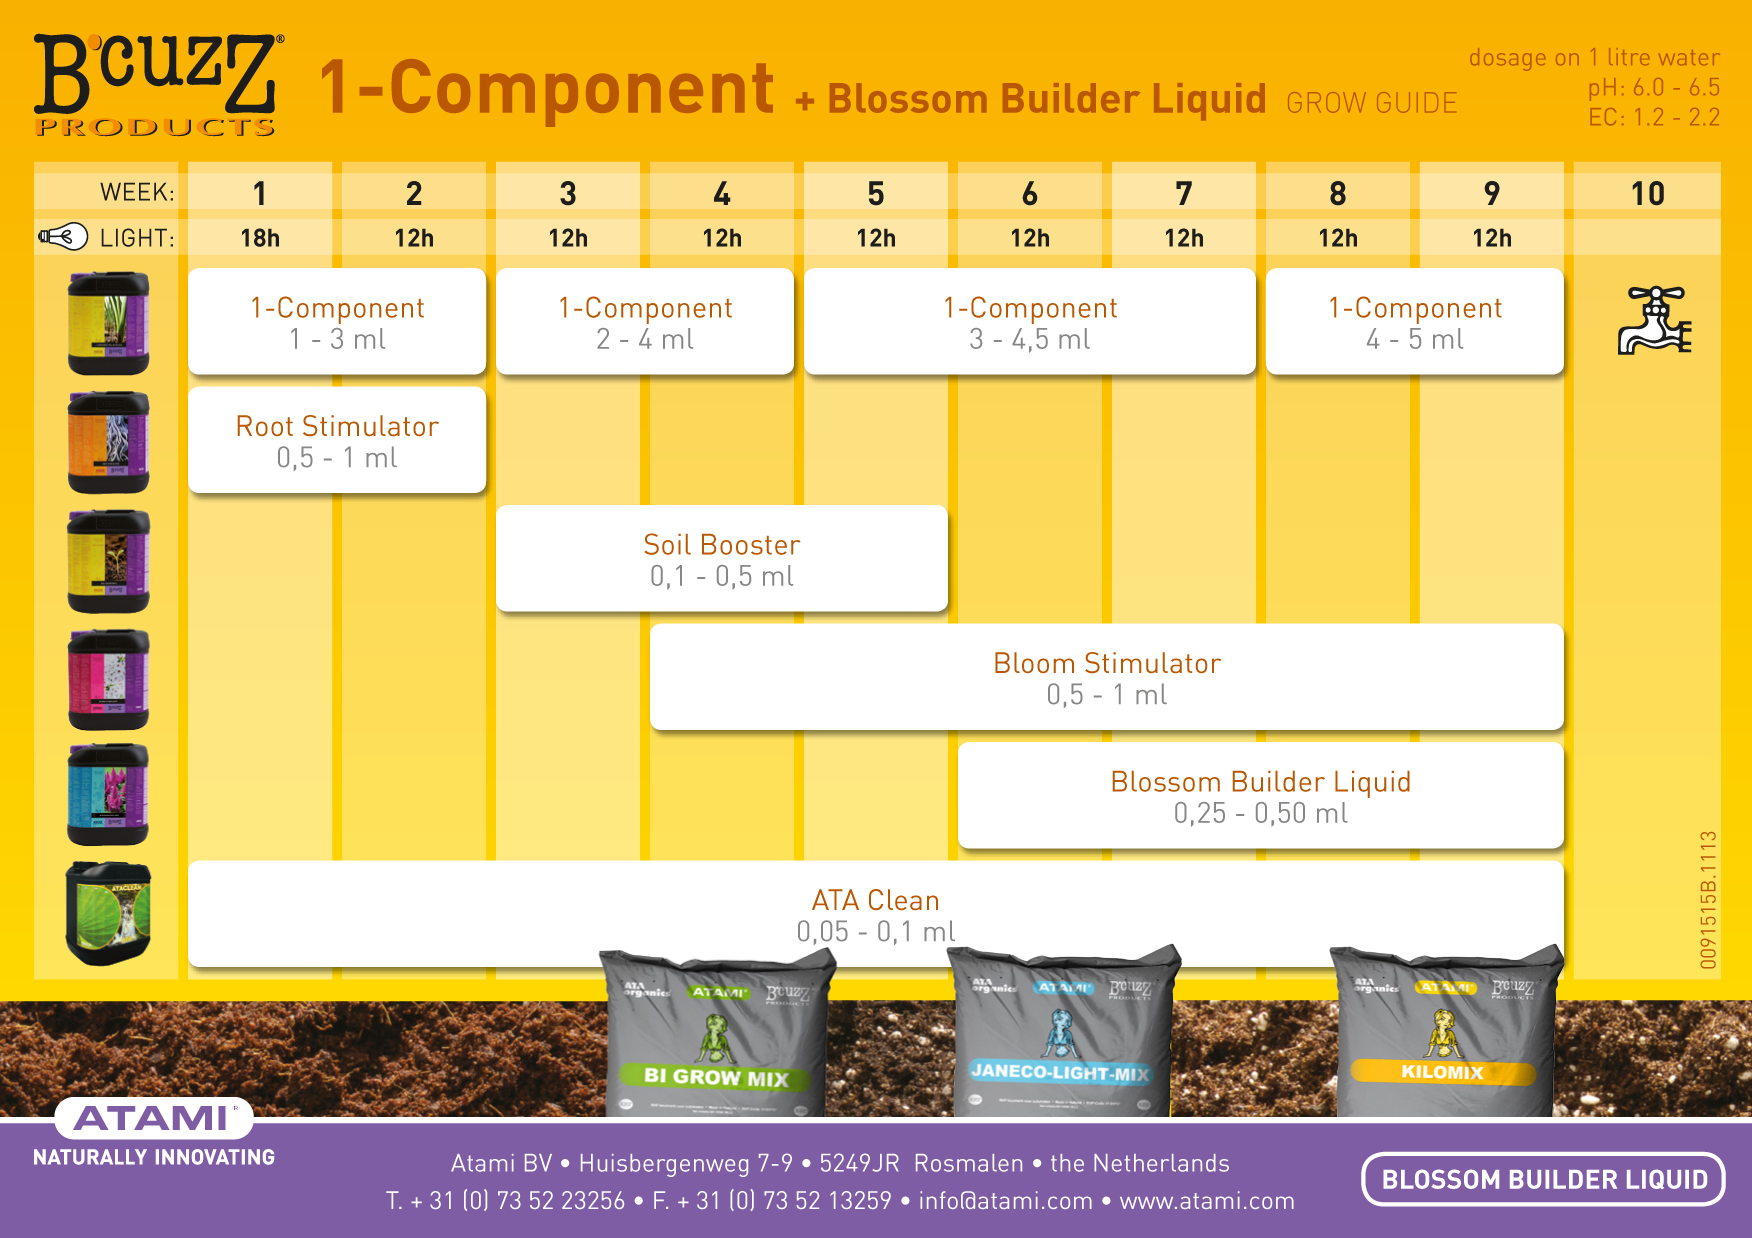 B'cuzz Soil Booster Universal